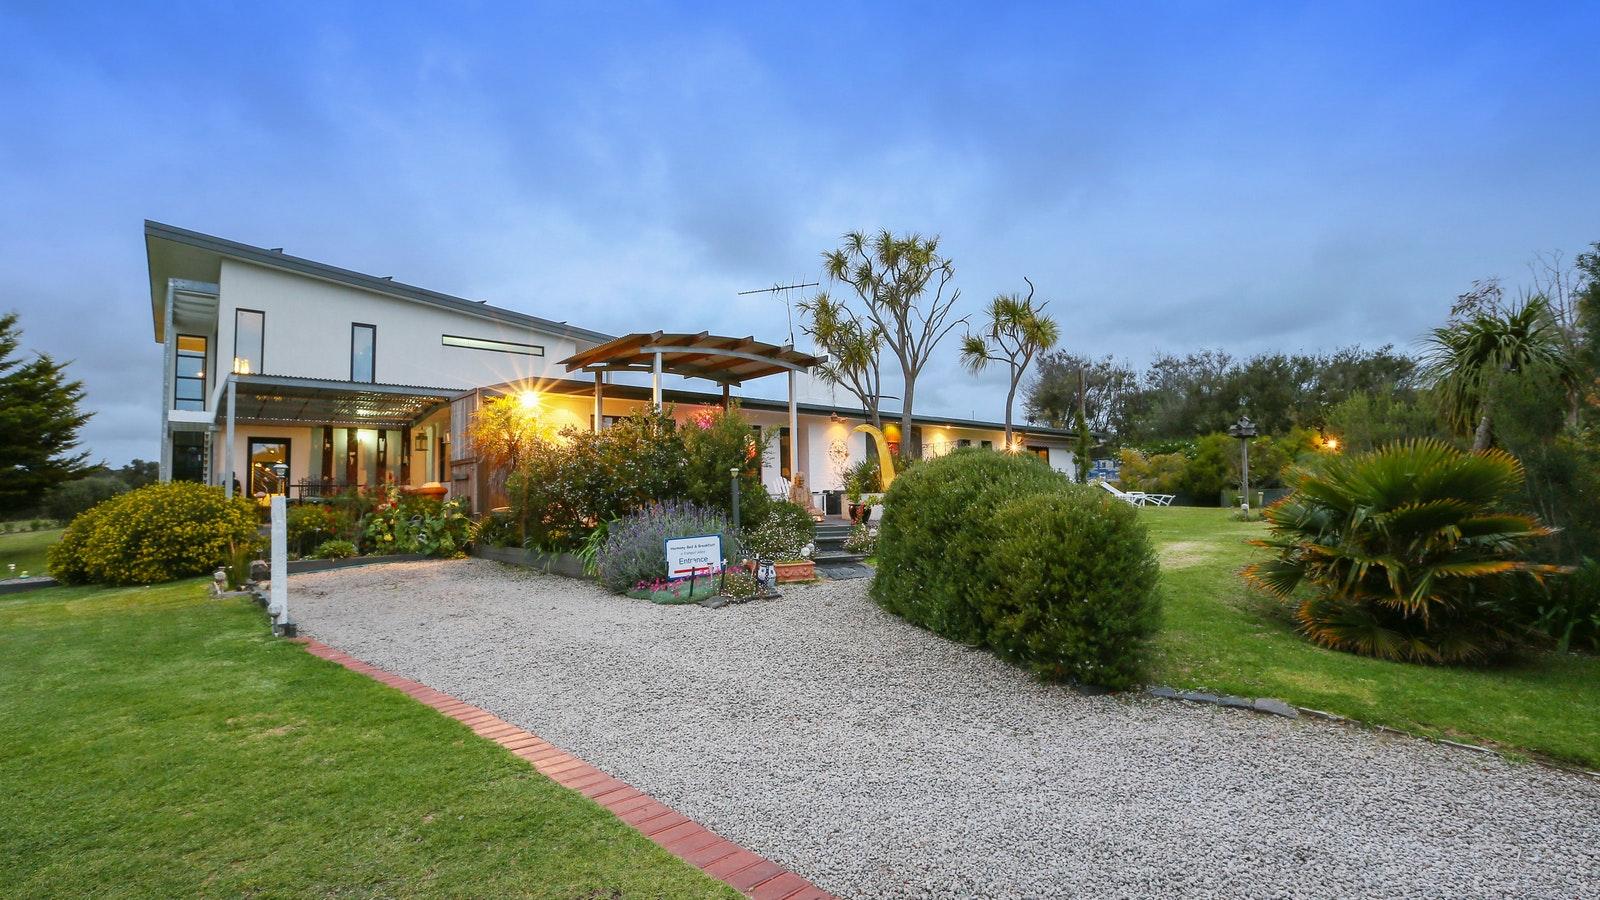 Bed And Breakfast Mornington Peninsula Melbourne